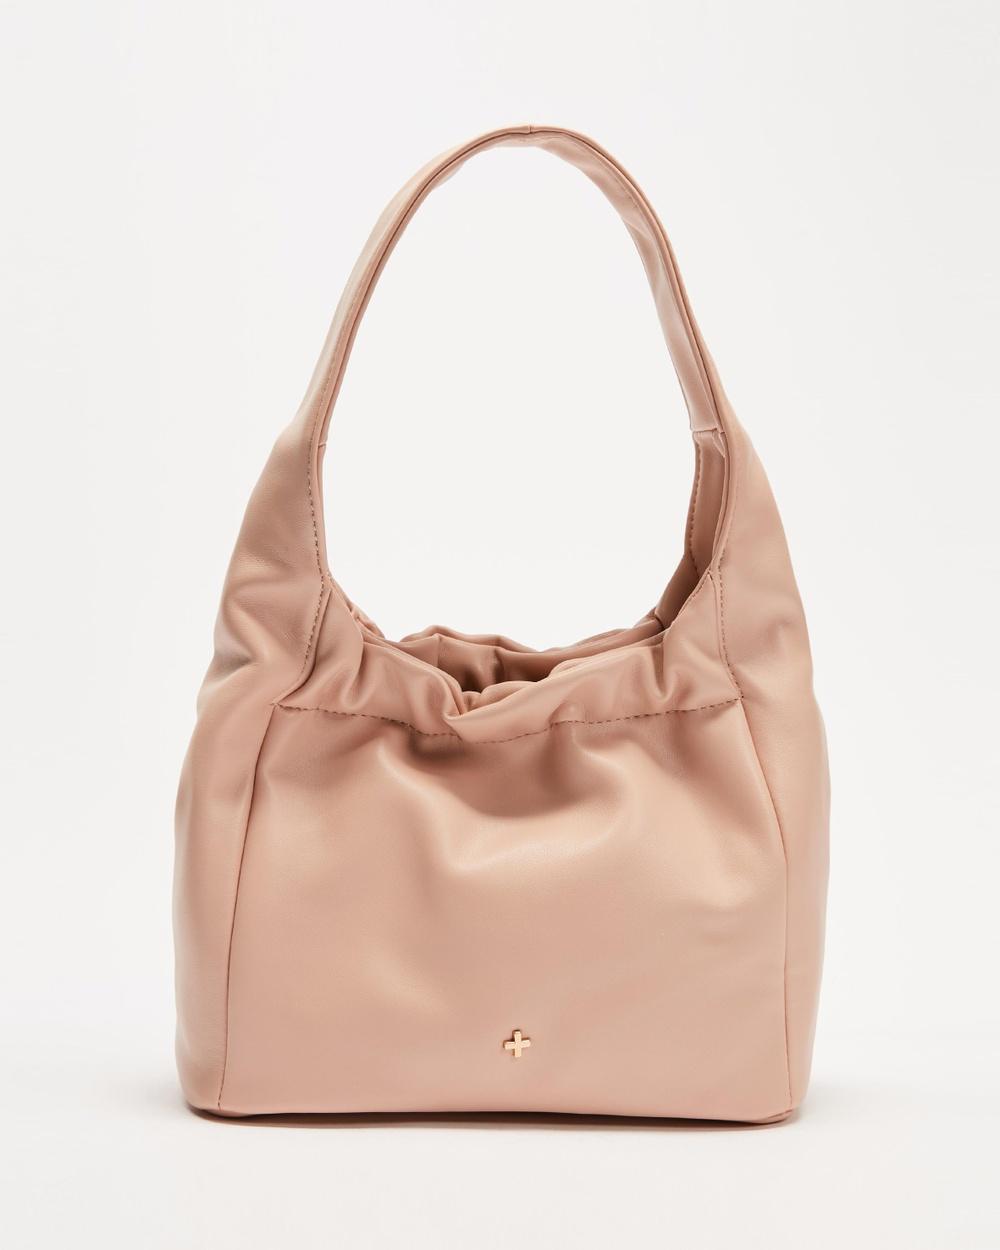 PETA AND JAIN Ventura Handbags Pink